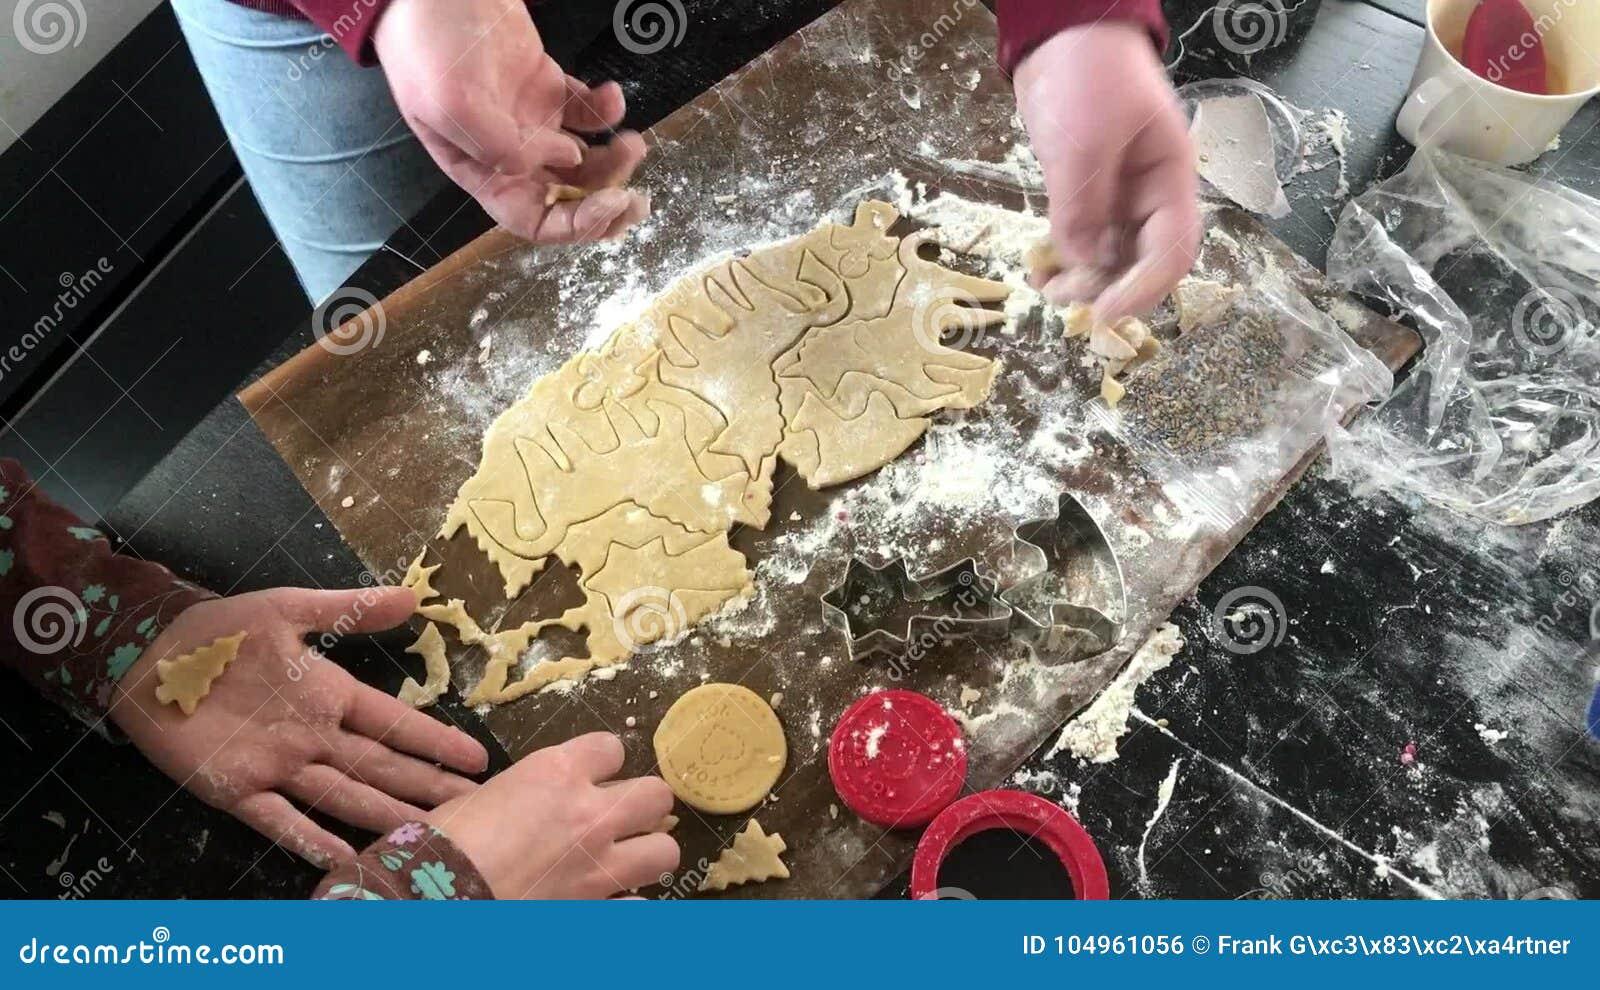 Childrens Hands Making Unicorn Shaped Christmas Cookies